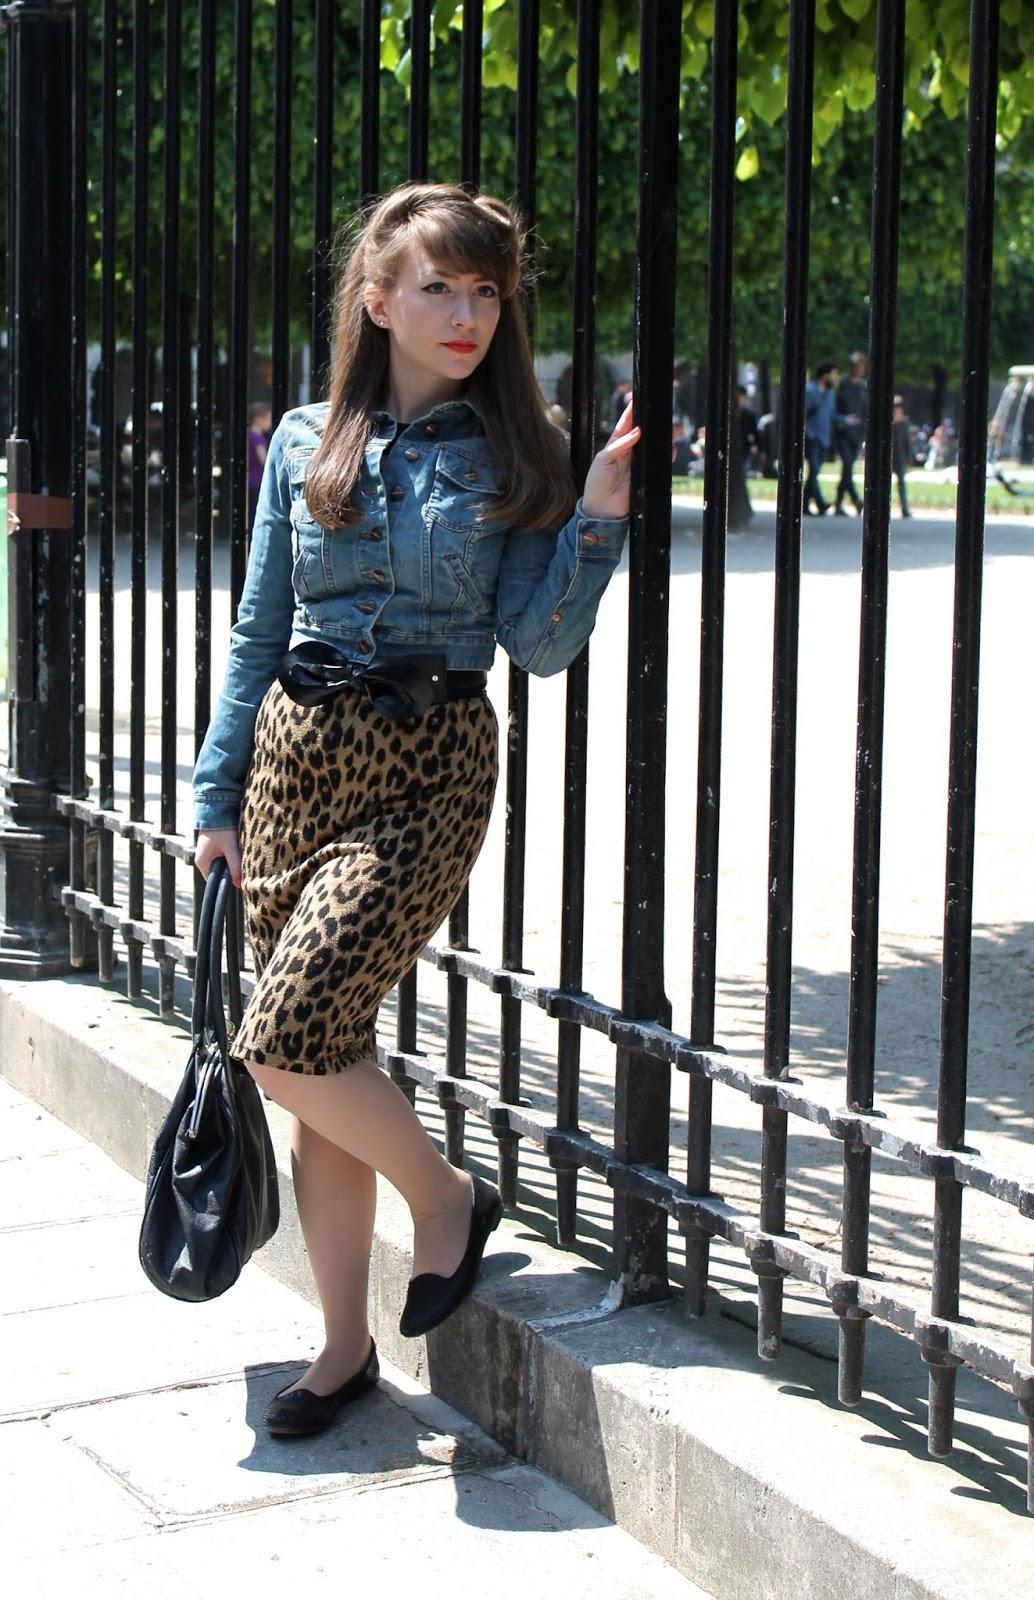 Denim jacket, leopard print skirt